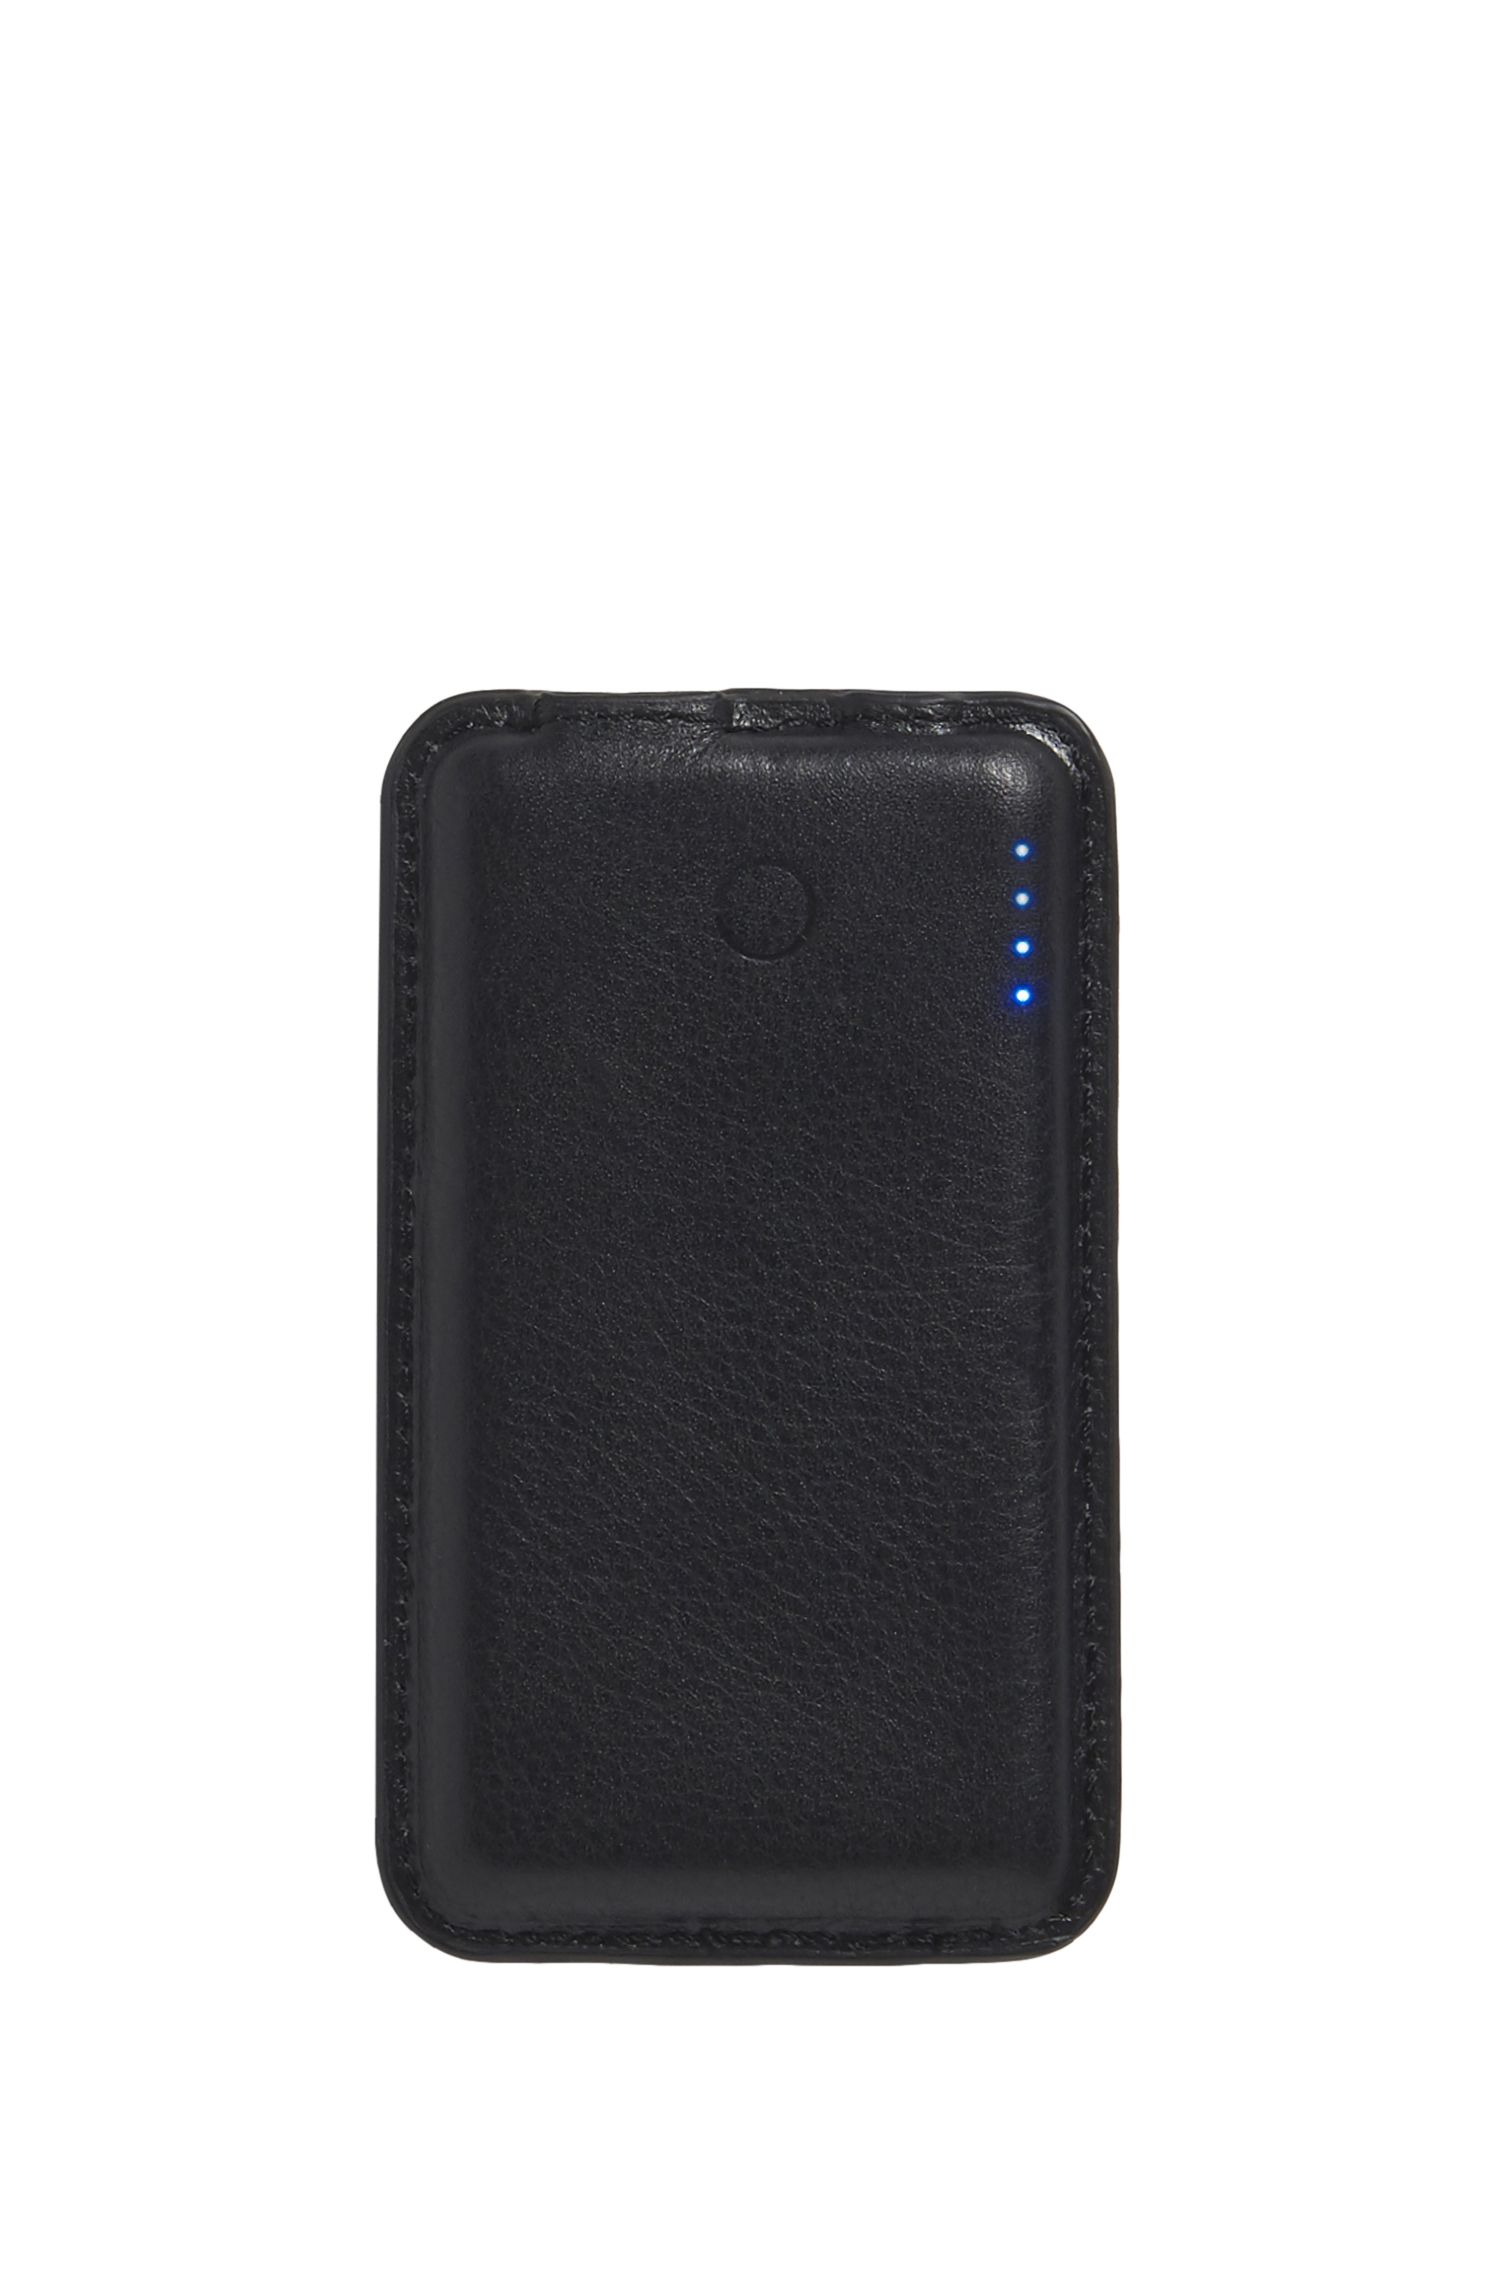 Phone Powerbank, Black